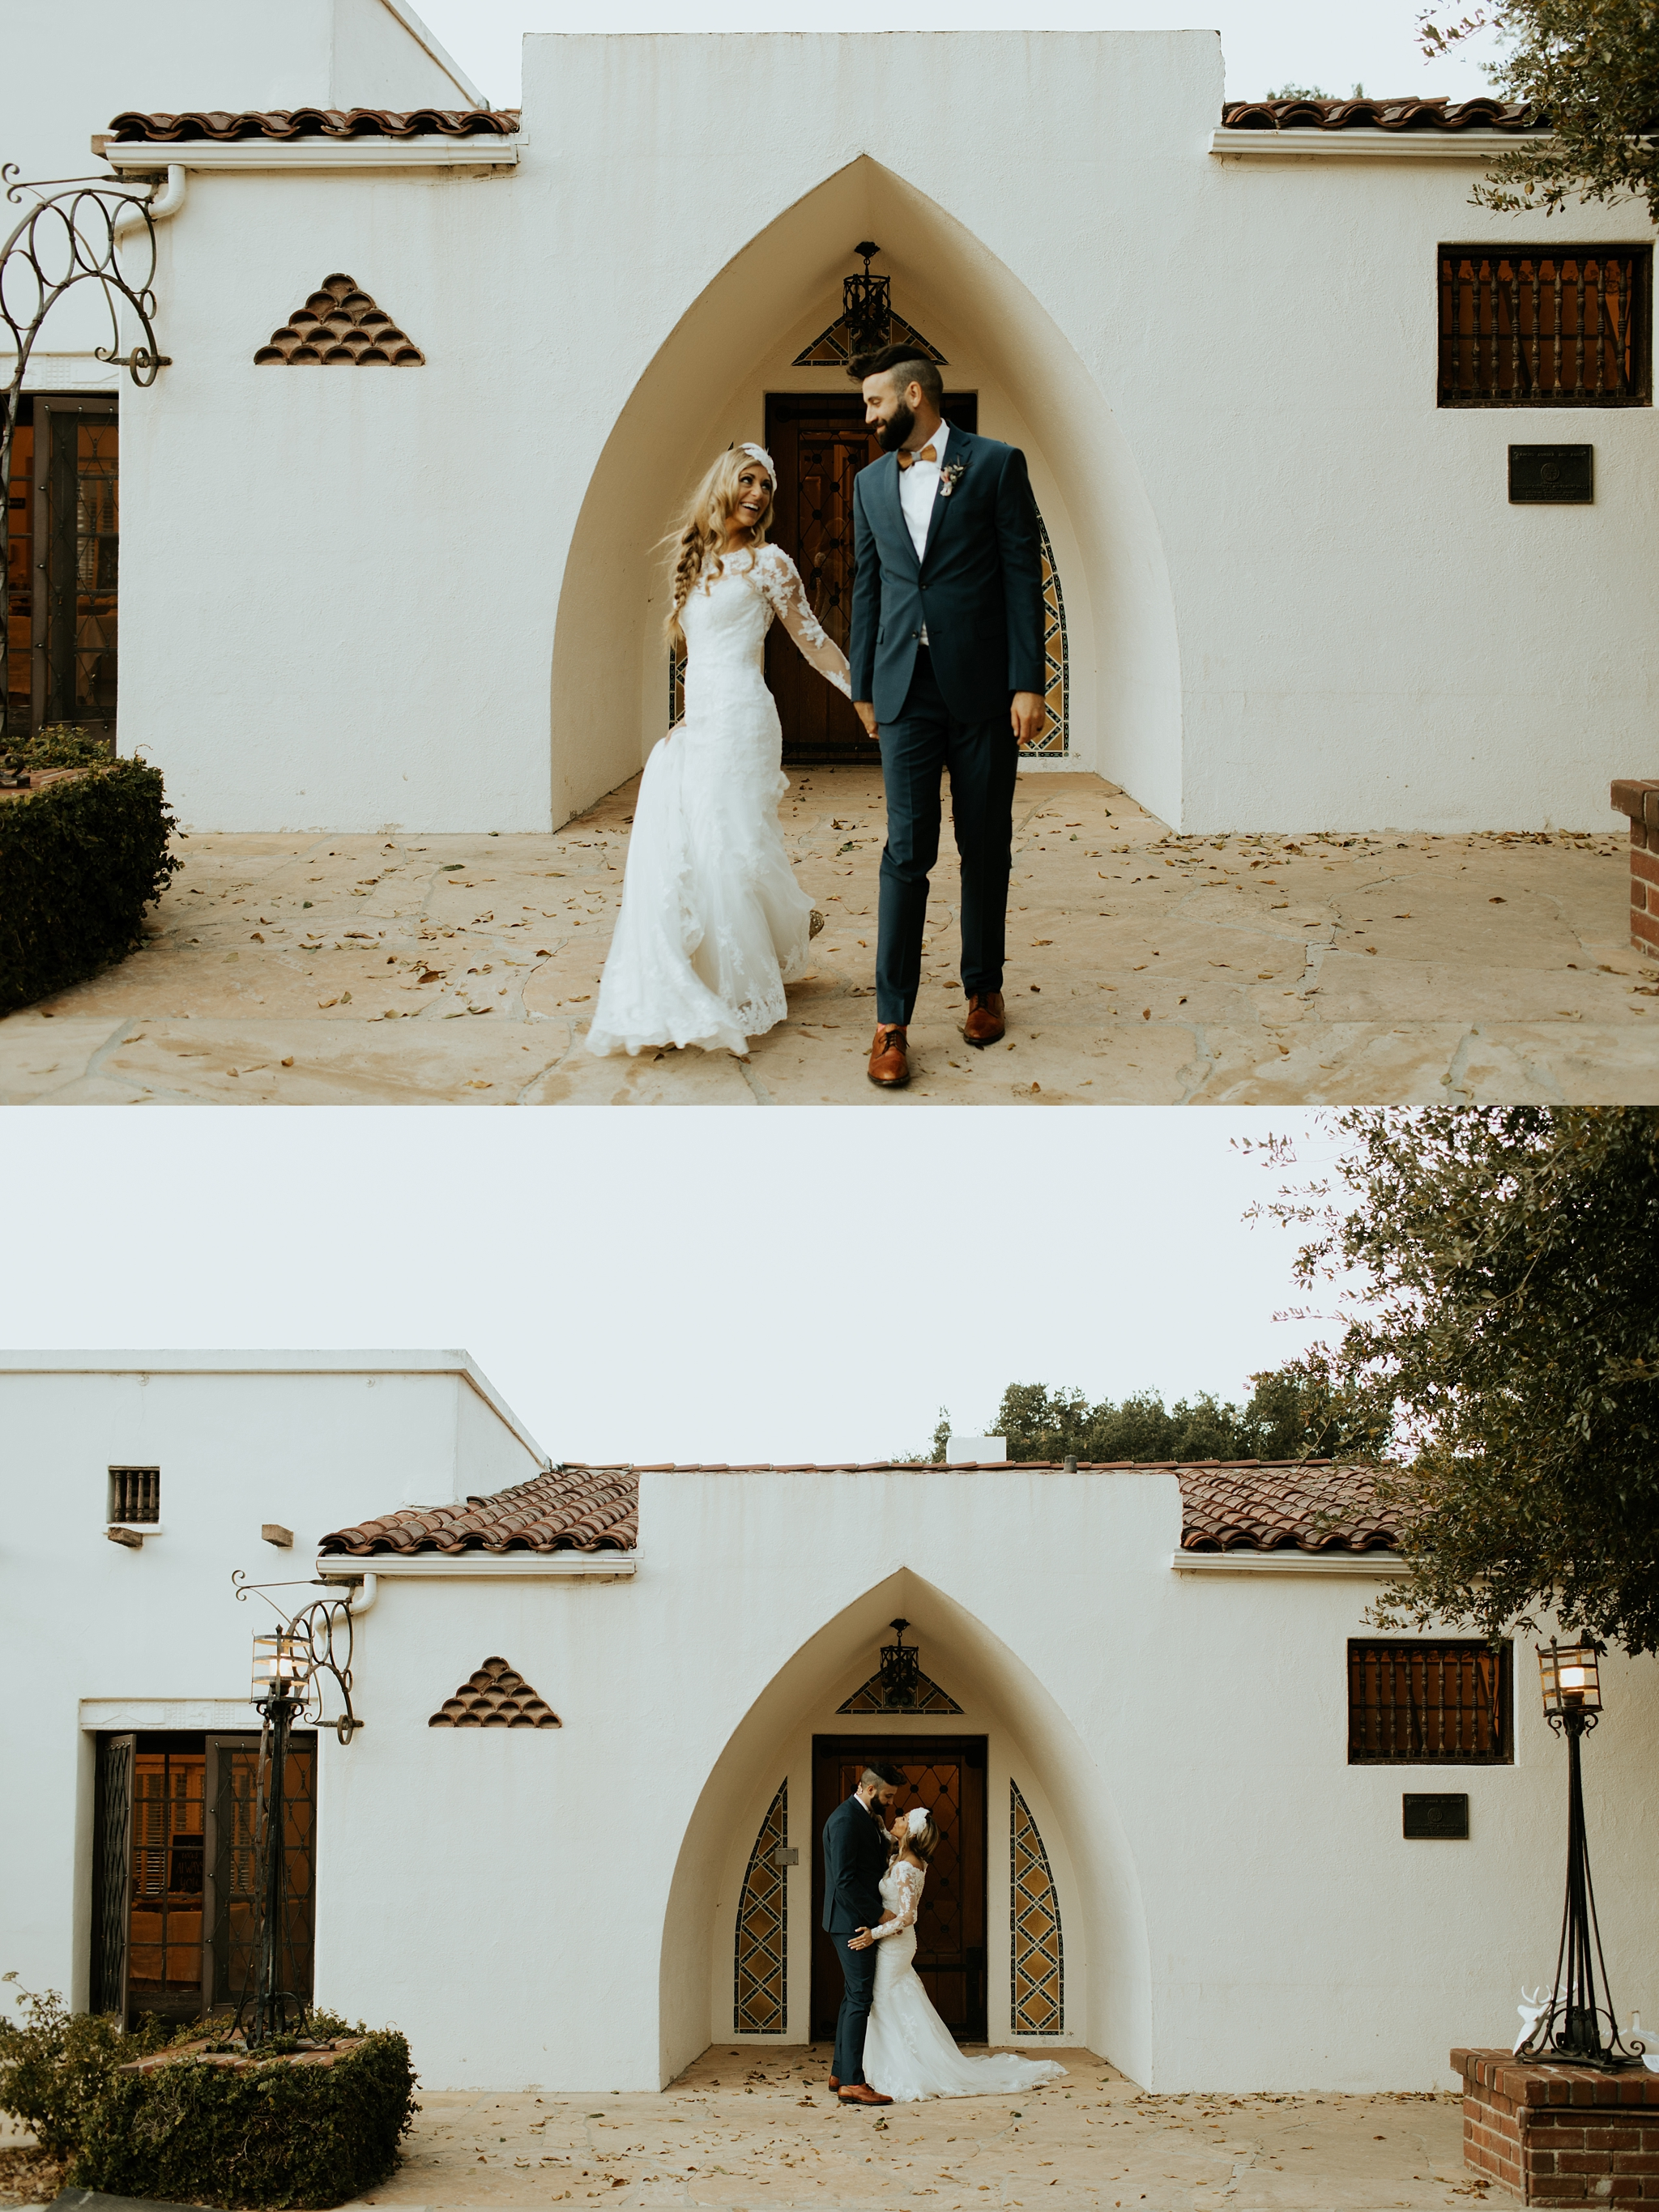 Bohemian Orcutt Ranch Wedding in Los Angeles California  - Los Angeles Californai Wedding Photographer_0043.jpg